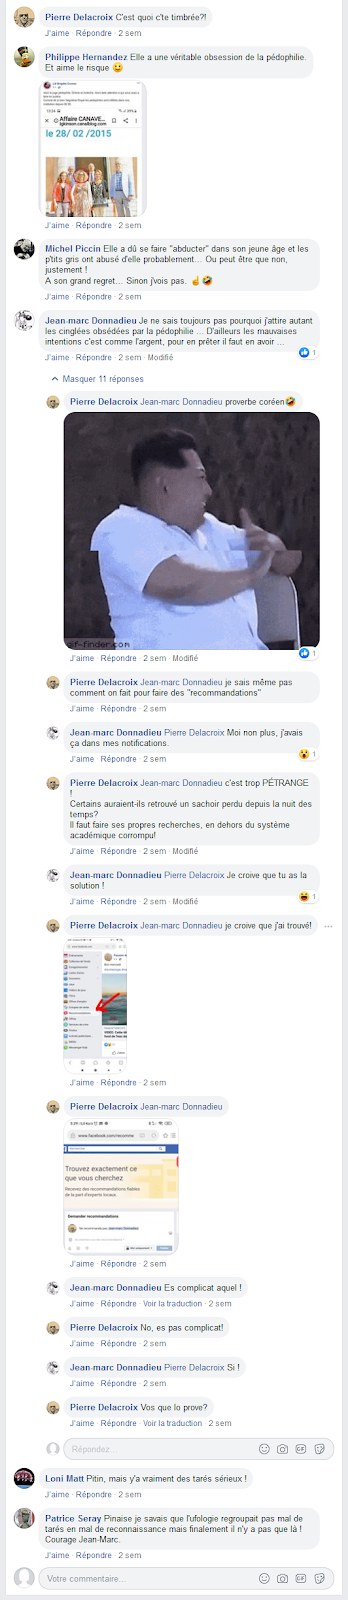 3%2BJean-marc%2BDonnadieu%2B-%2Bwww.facebook.com dans Le Post